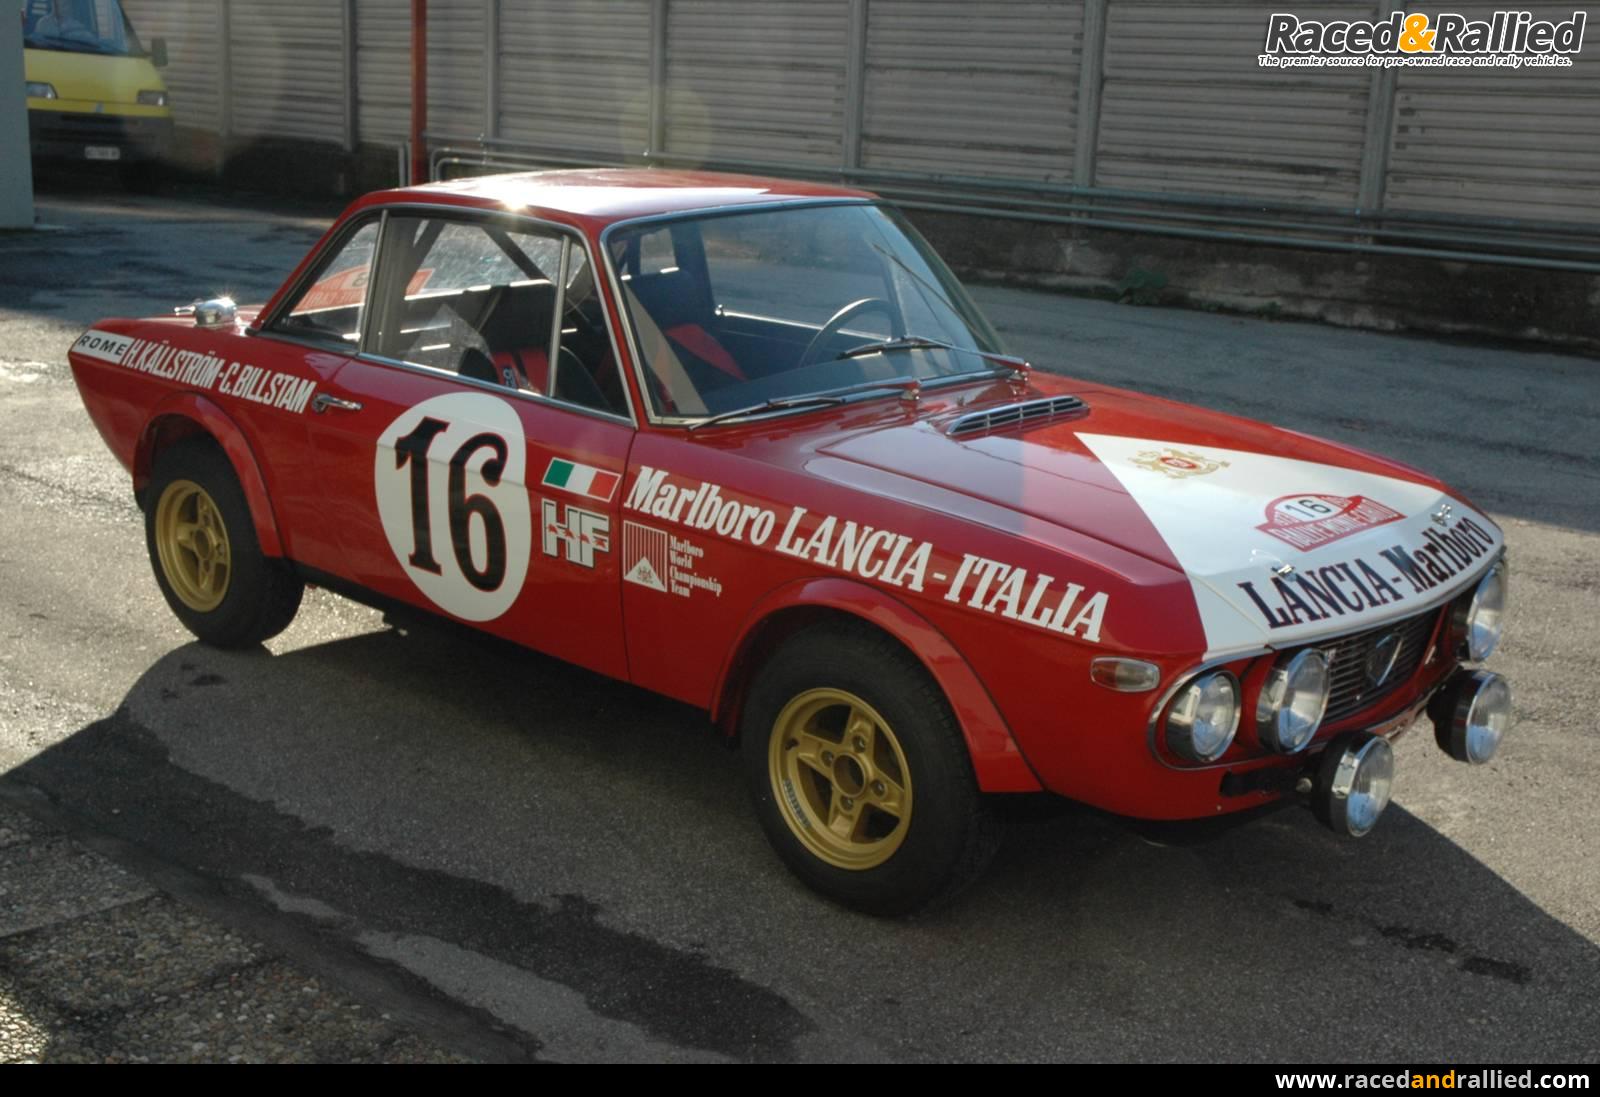 Lancia Fulvia 1.6 HF Marlboro - EX WORKS | Rally Cars for sale at ...